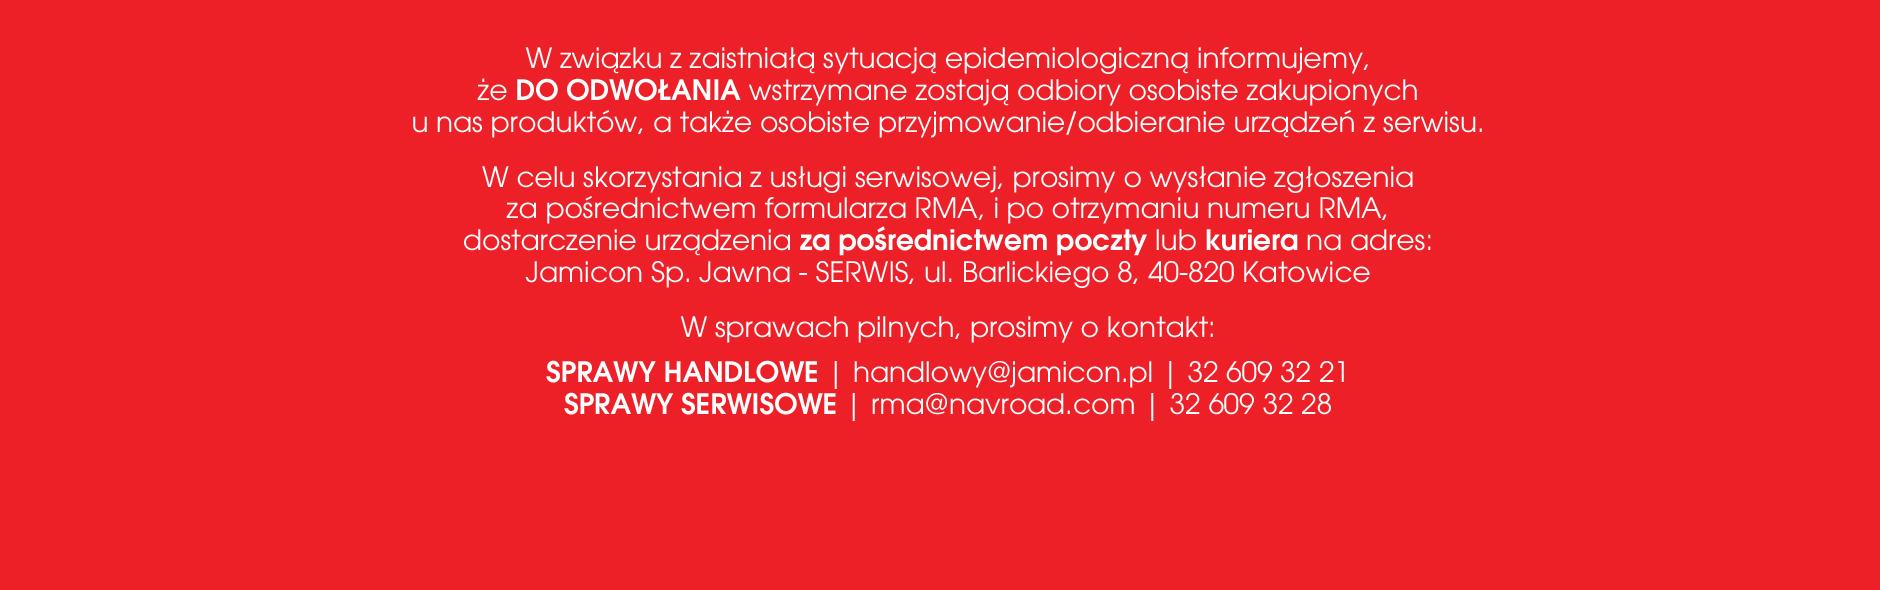 UWAGA-EPIDEMIA_NAVROAD_lipiec